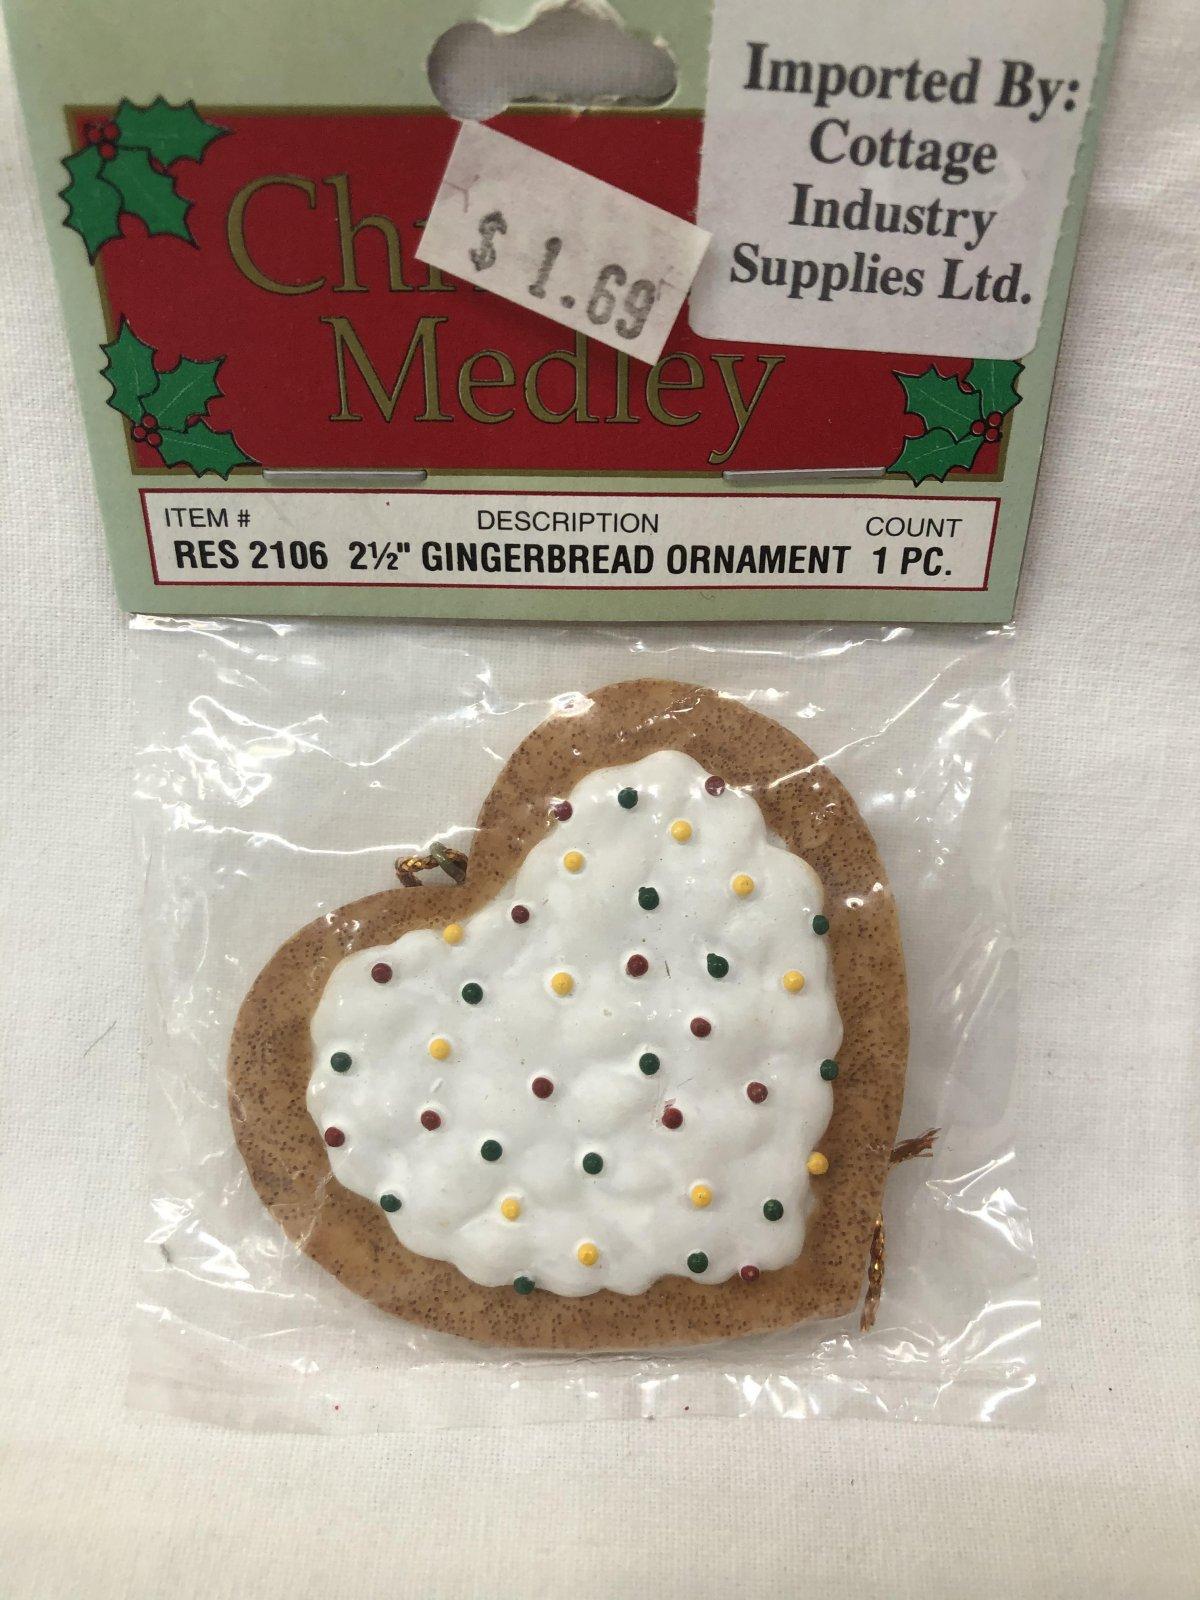 Christmas Medley Heart Gingerbread Ornament 717656130592